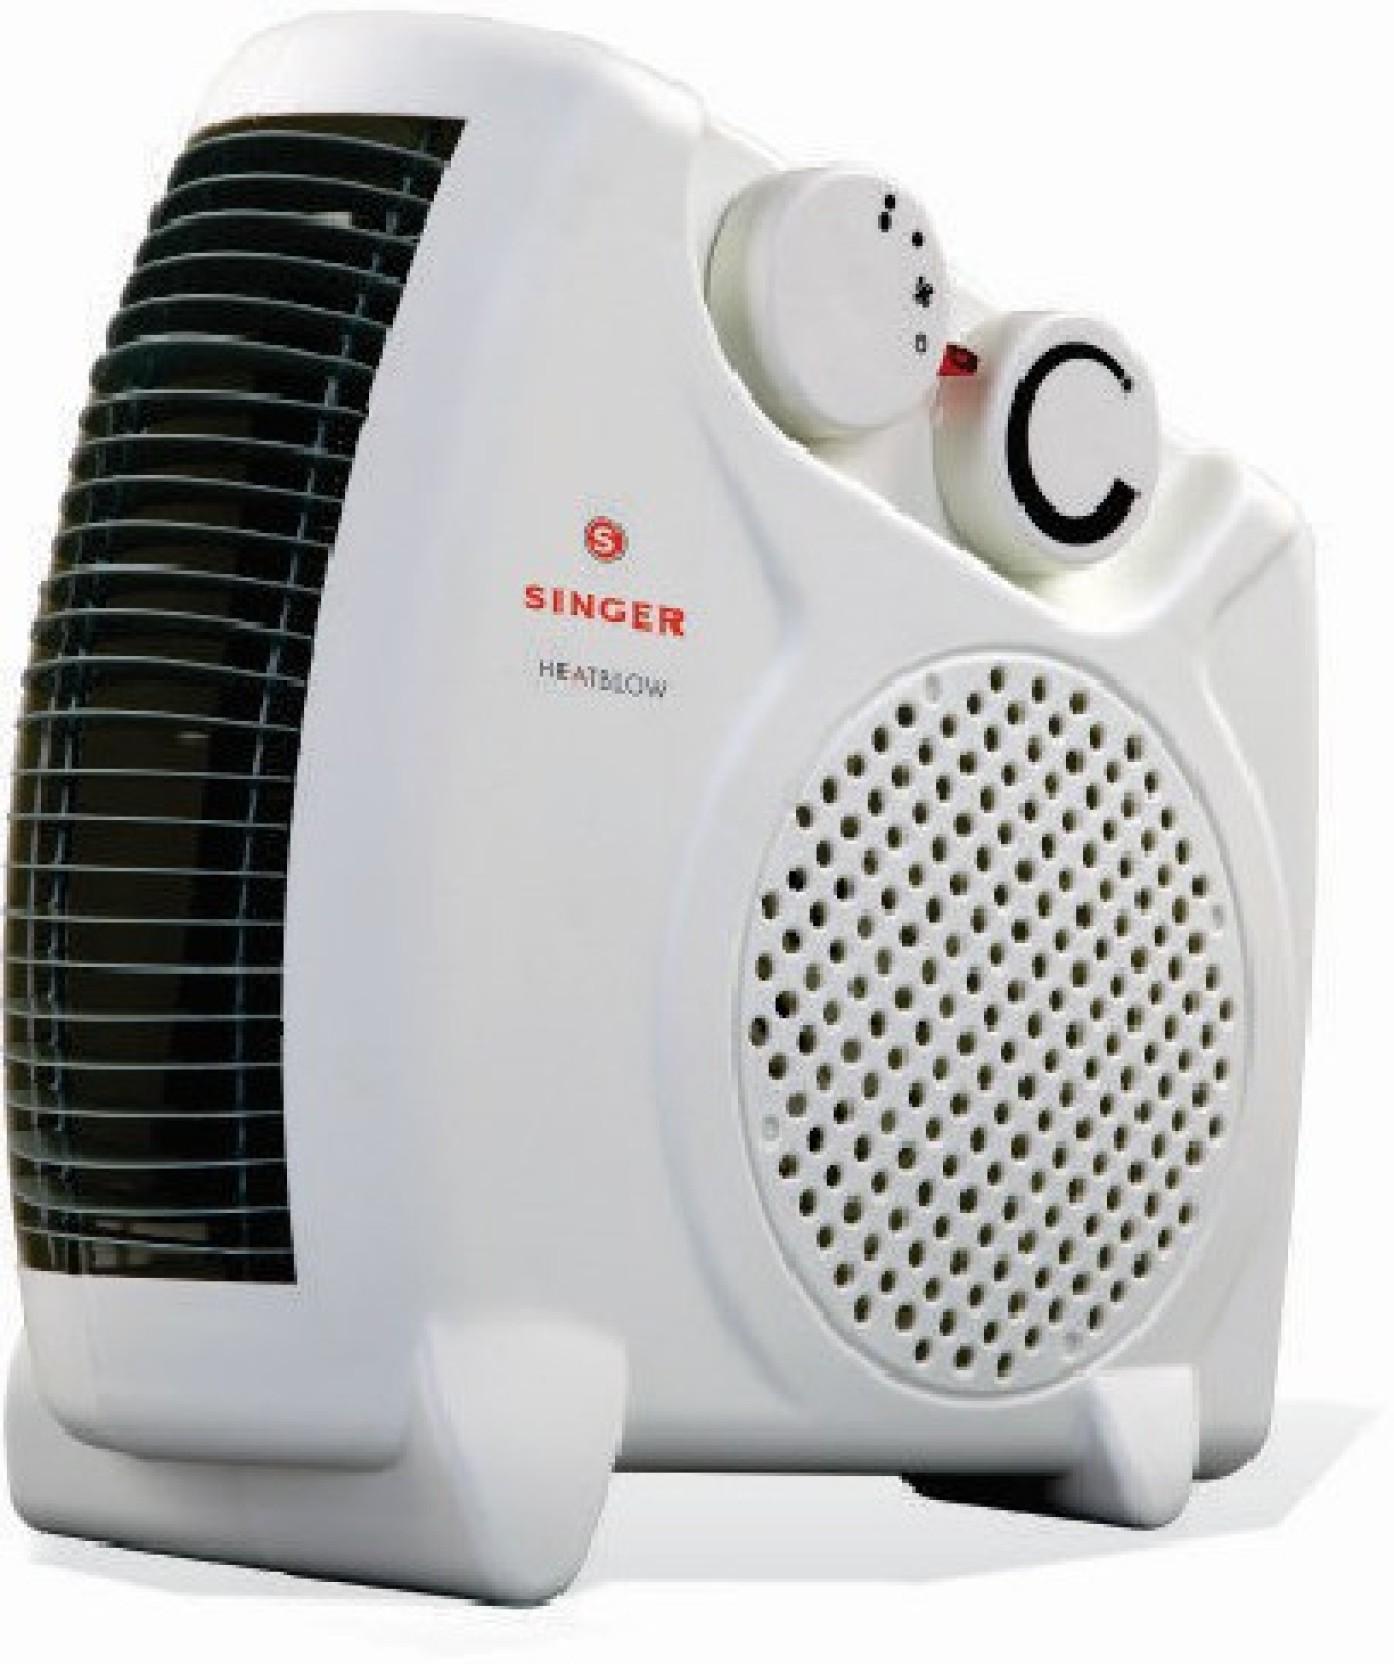 Singer Heat Blow Fan Room Heater Price In India Buy Ac Wiring Add To Cart